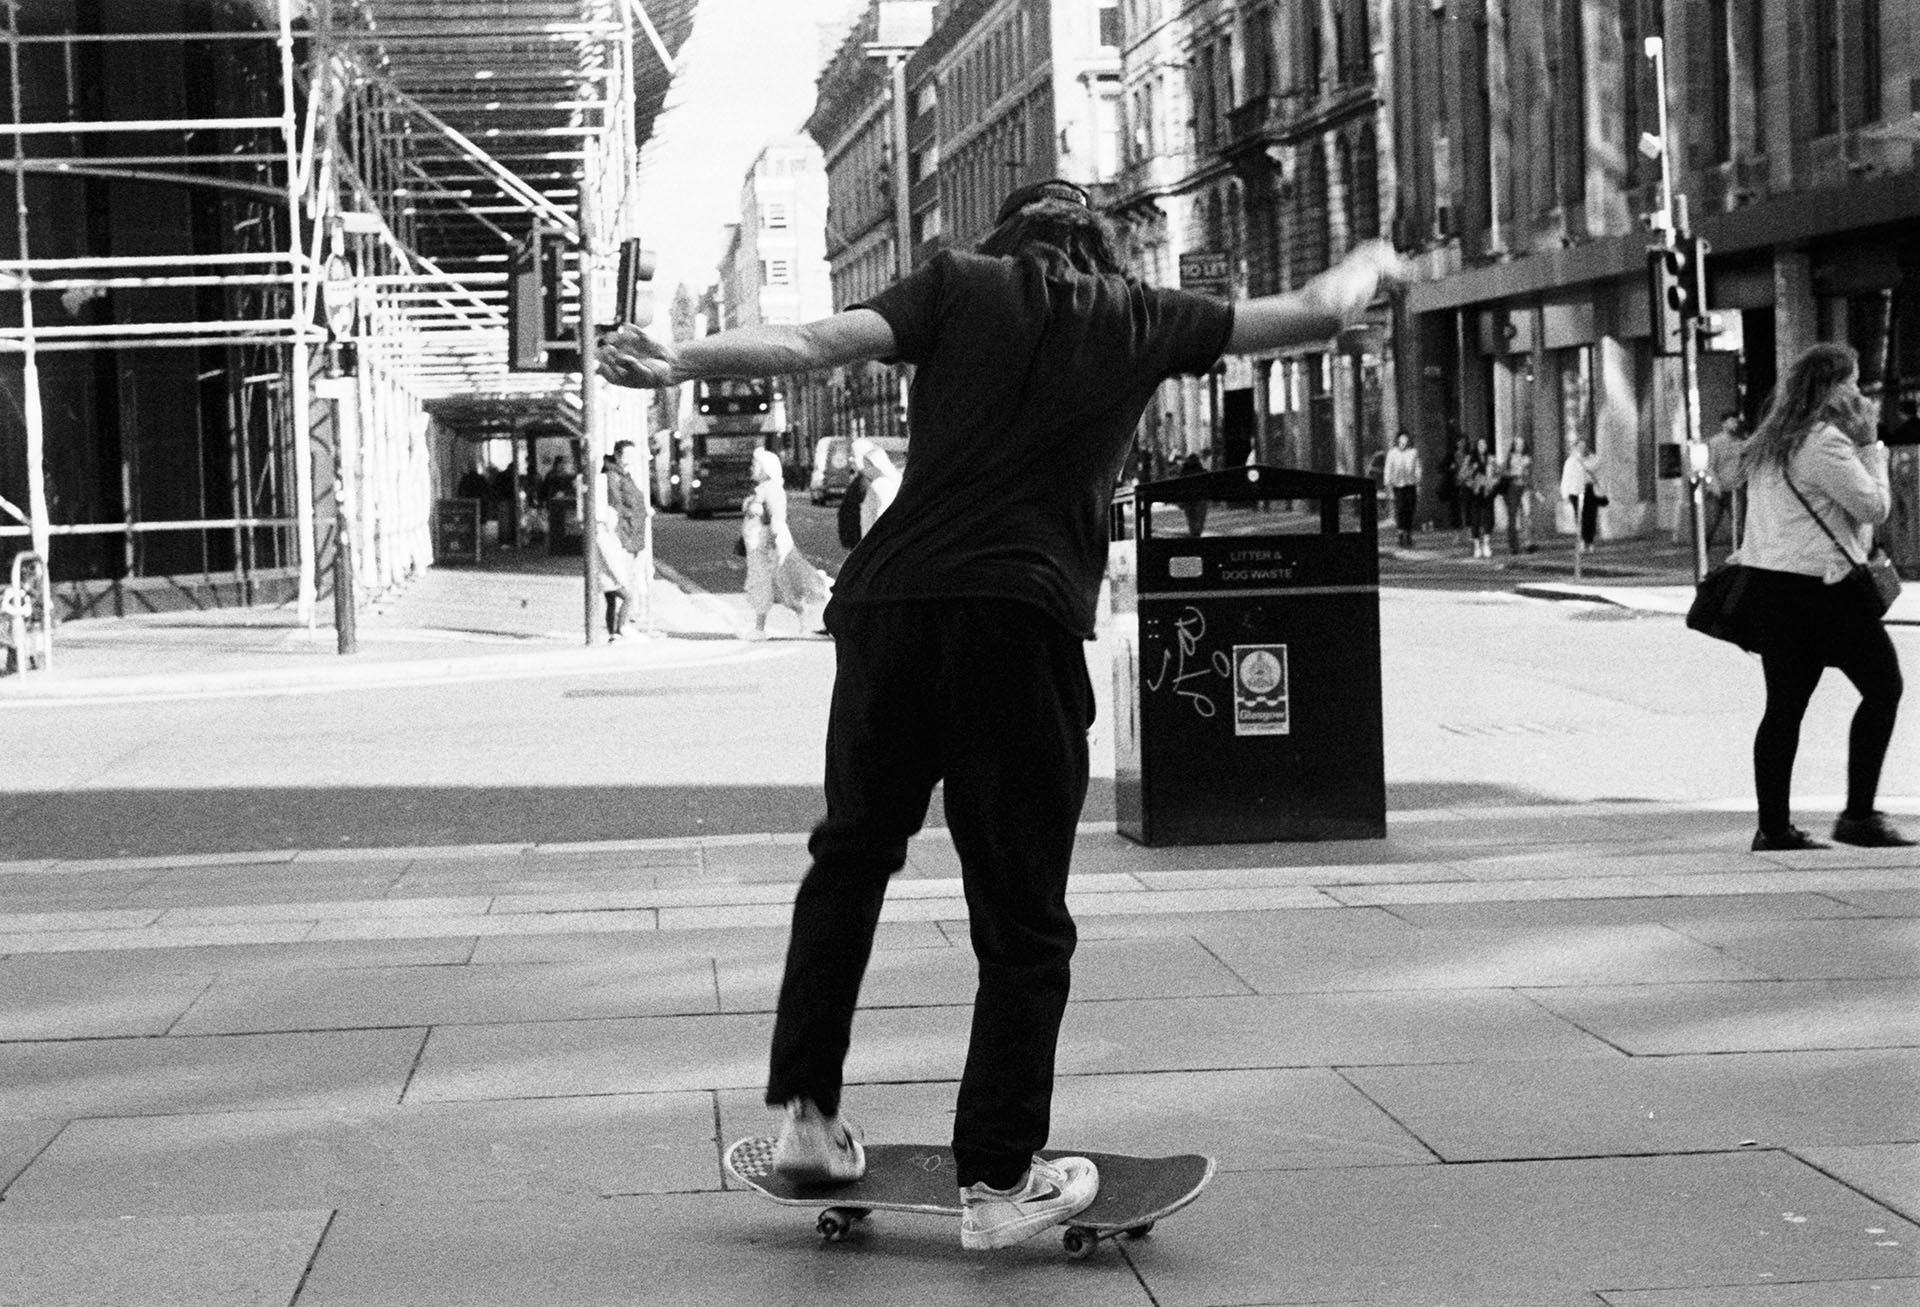 Glasgow skateboarding